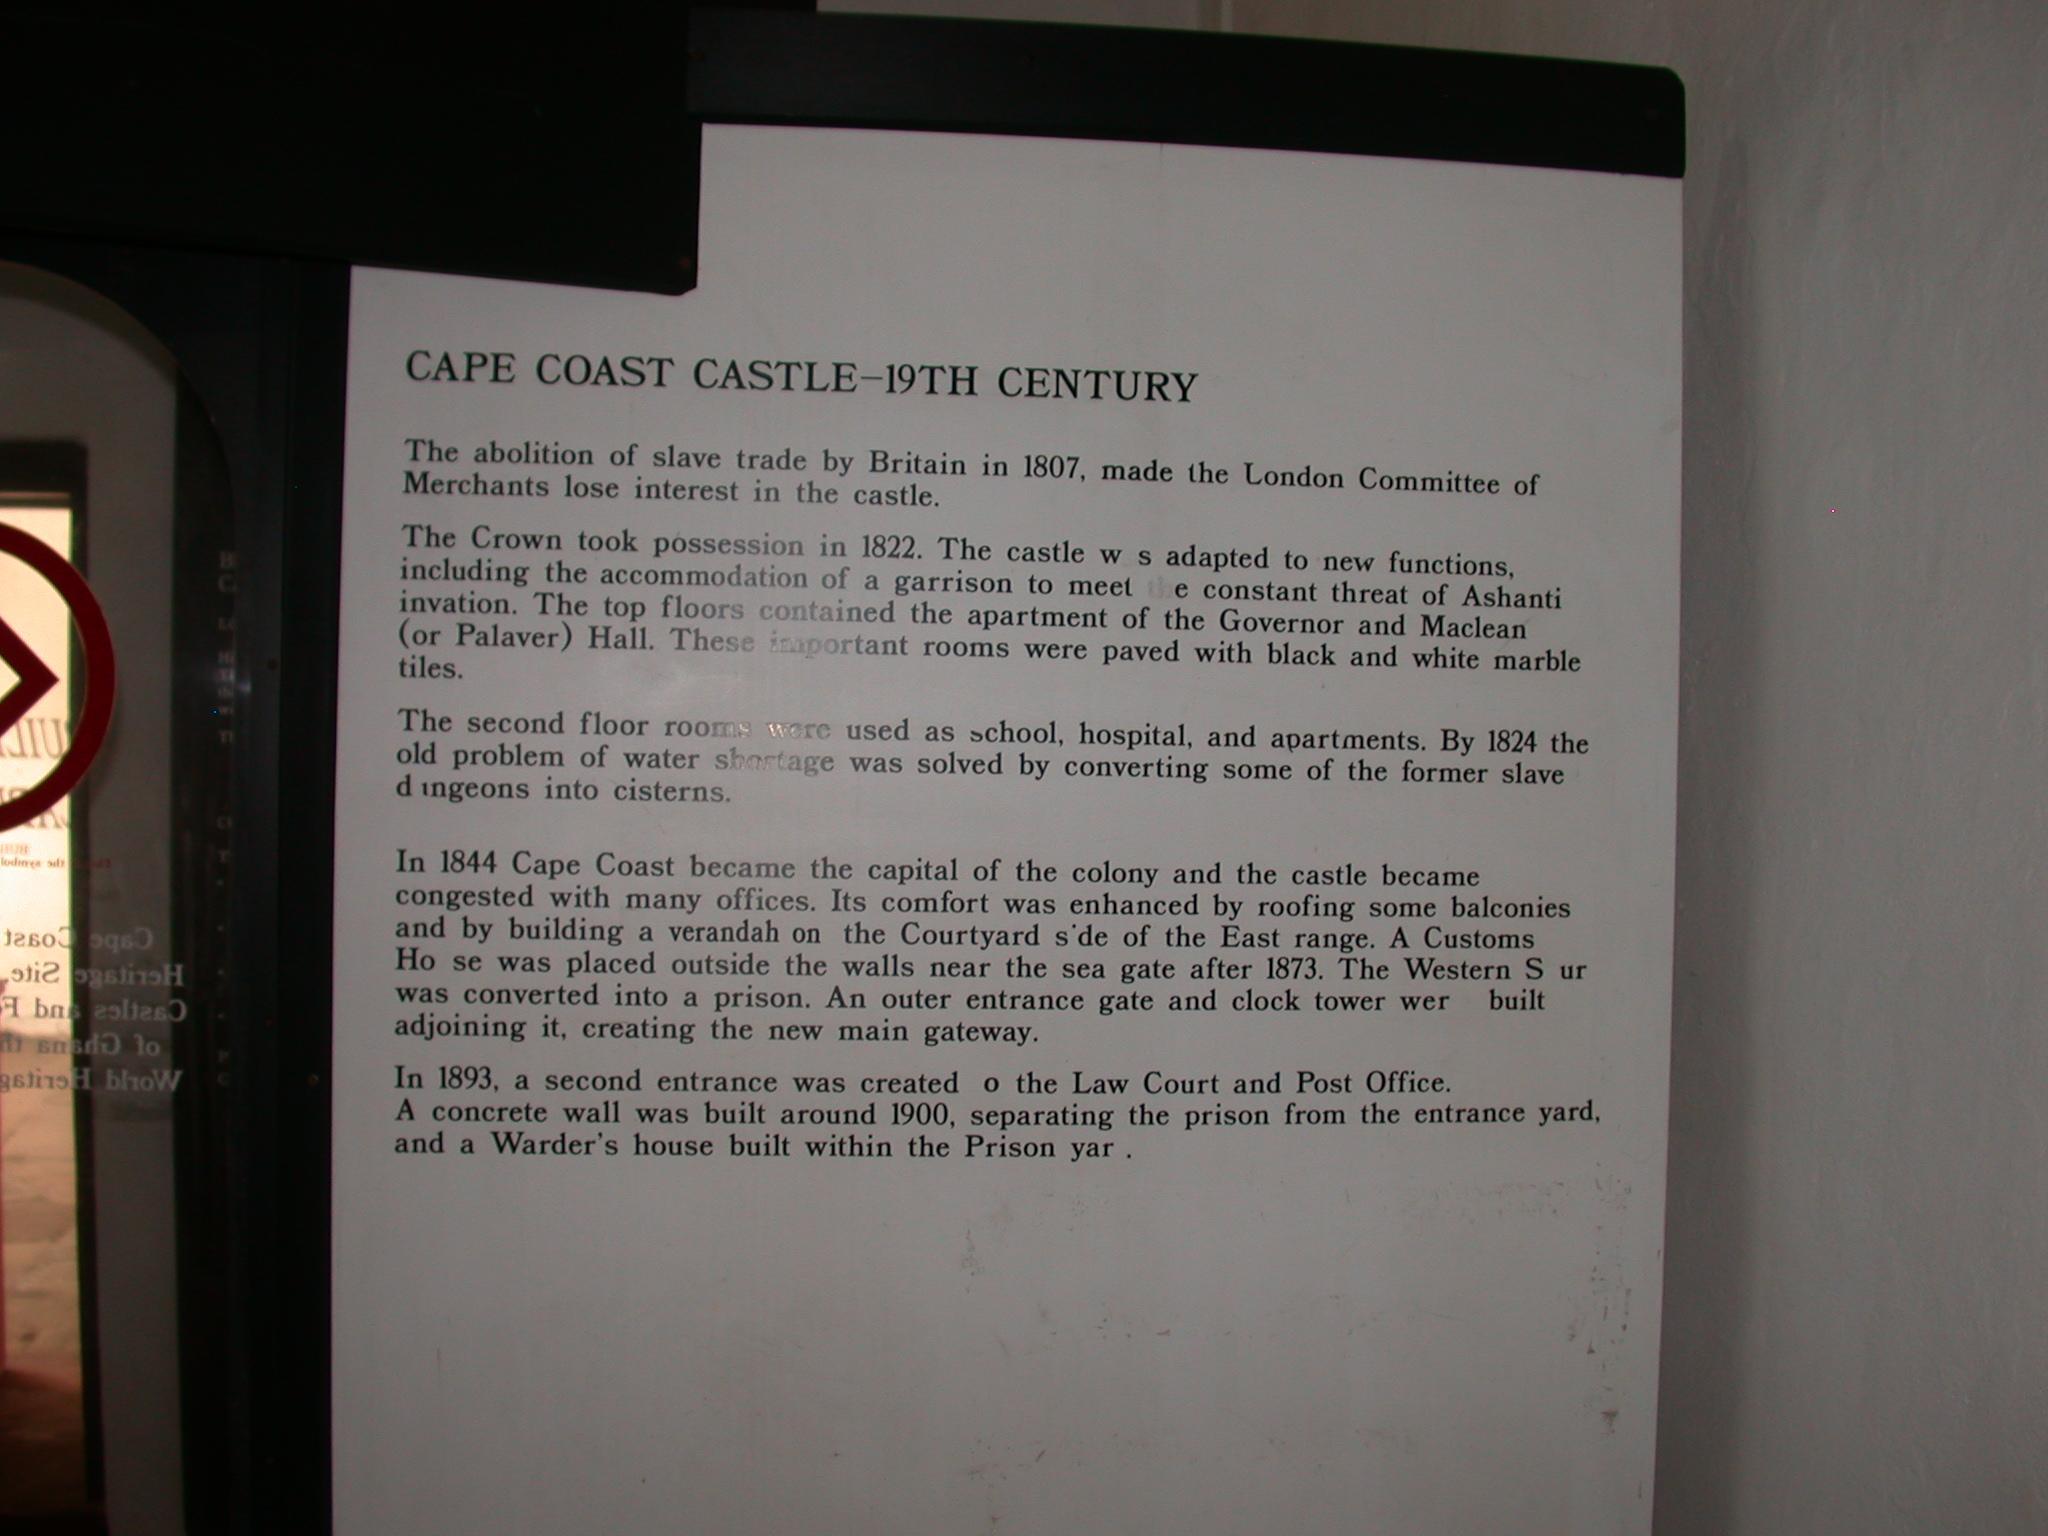 Cape Coast History Description, Cape Coast Slave Fort Museum, Cape Coast, Ghana